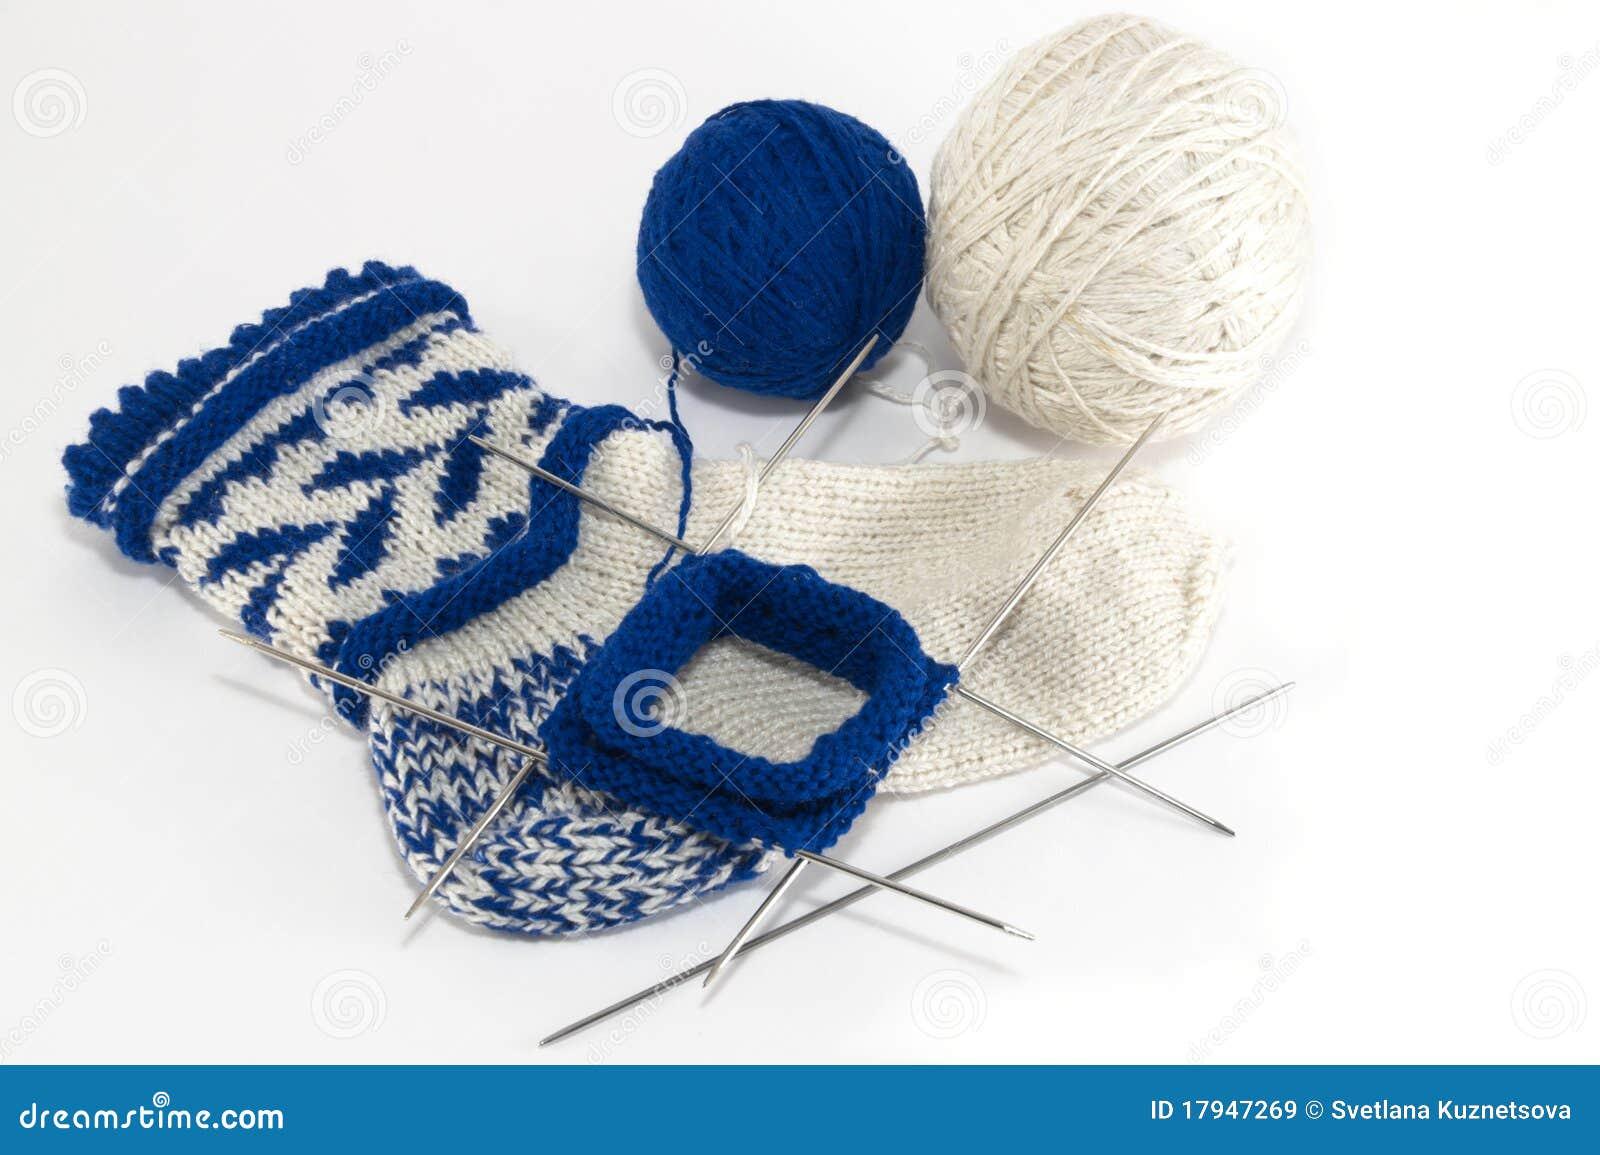 Knitting Pattern For Socks On Five Needles : Knitting Socks Royalty Free Stock Images - Image: 17947269